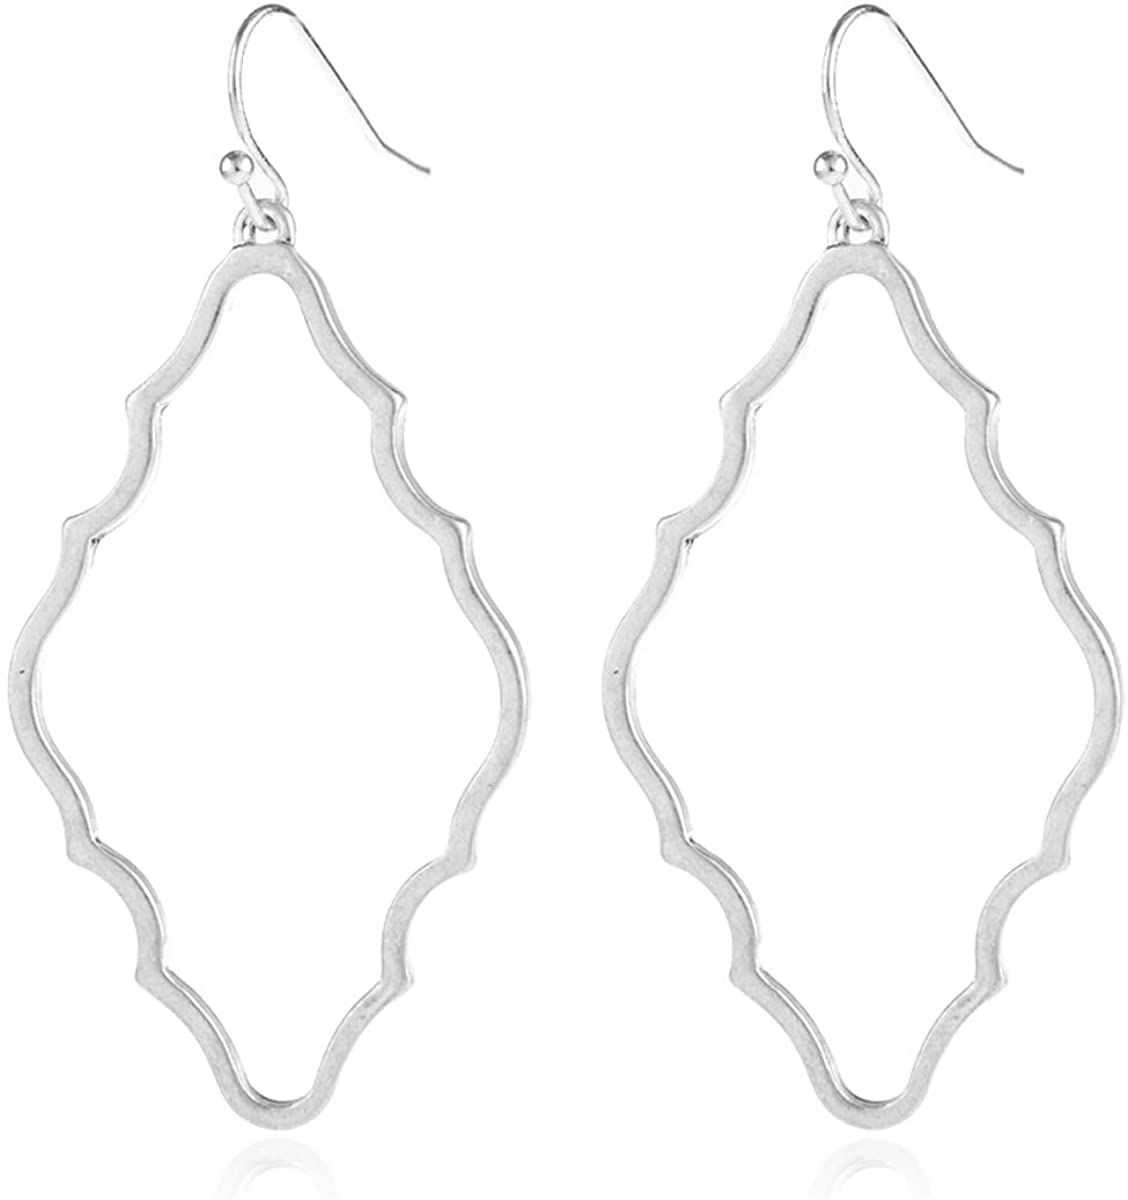 Moroccan Filigree Geometric Drop Earrings - Bohemian Metallic Cutout Hook Lightweight Dangles Flower Petal Leaf/Teardrop/Scallop/Circle/Quatrefoil